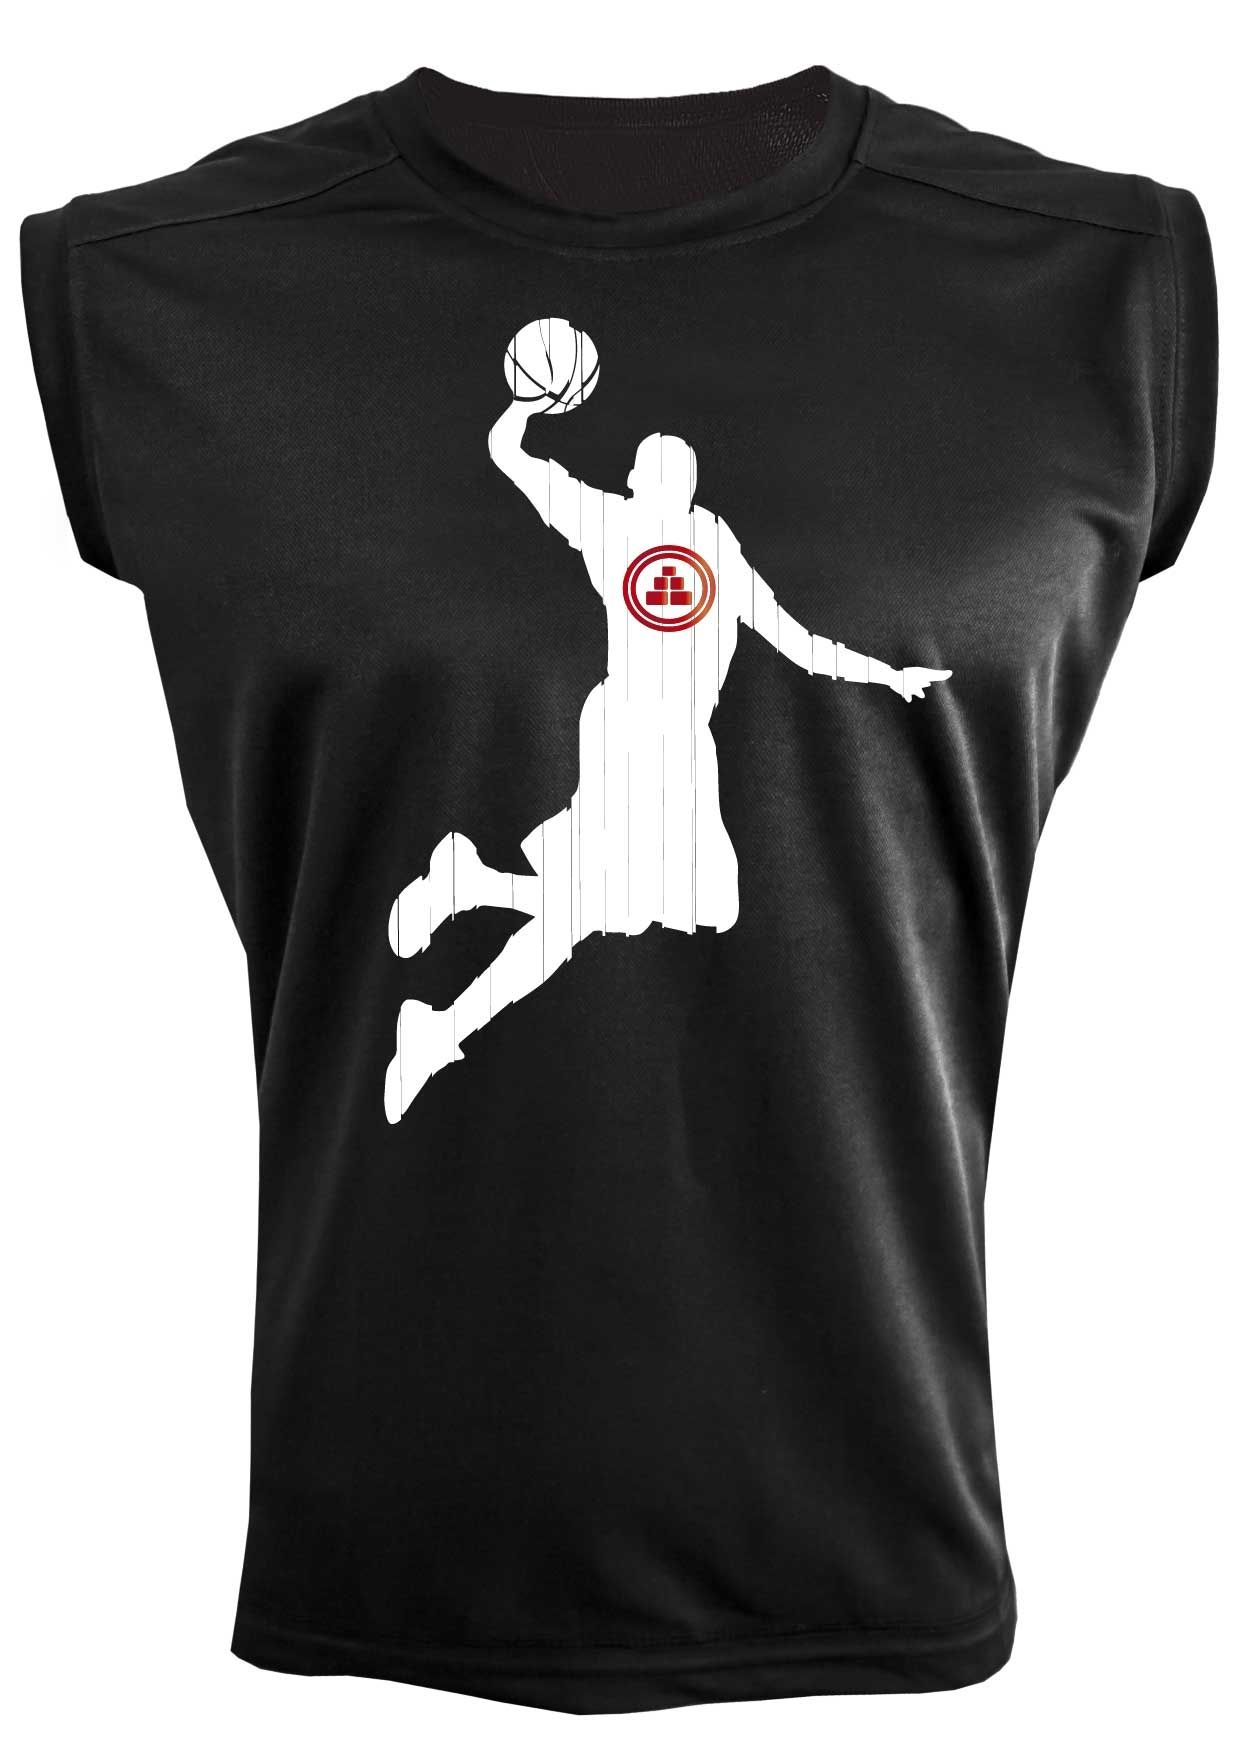 Camiseta sin mangas diseño baloncesto